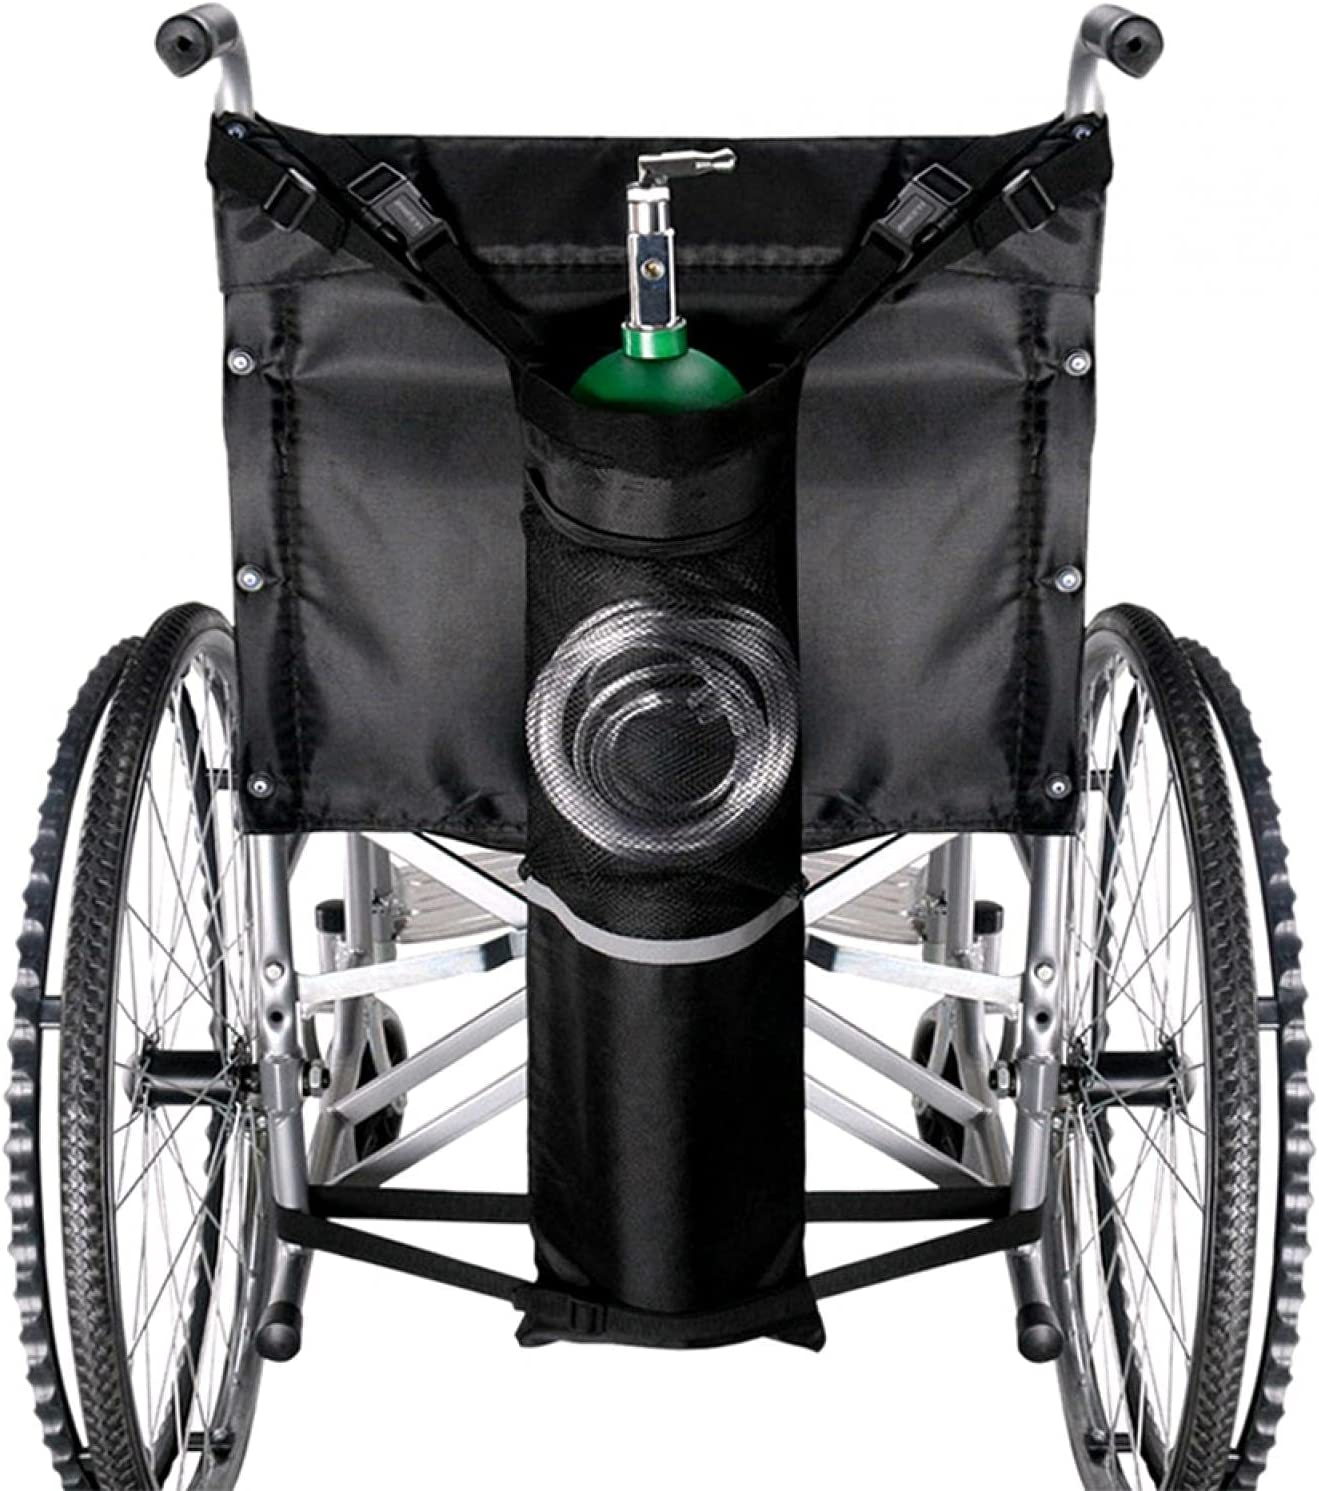 Jiakalamo Bolsa portátil para depósito de oxígeno para sillas de ruedas, bolsa de transporte de cilindro de oxígeno con correas ajustables(tamaño: 75 x 25 cm)